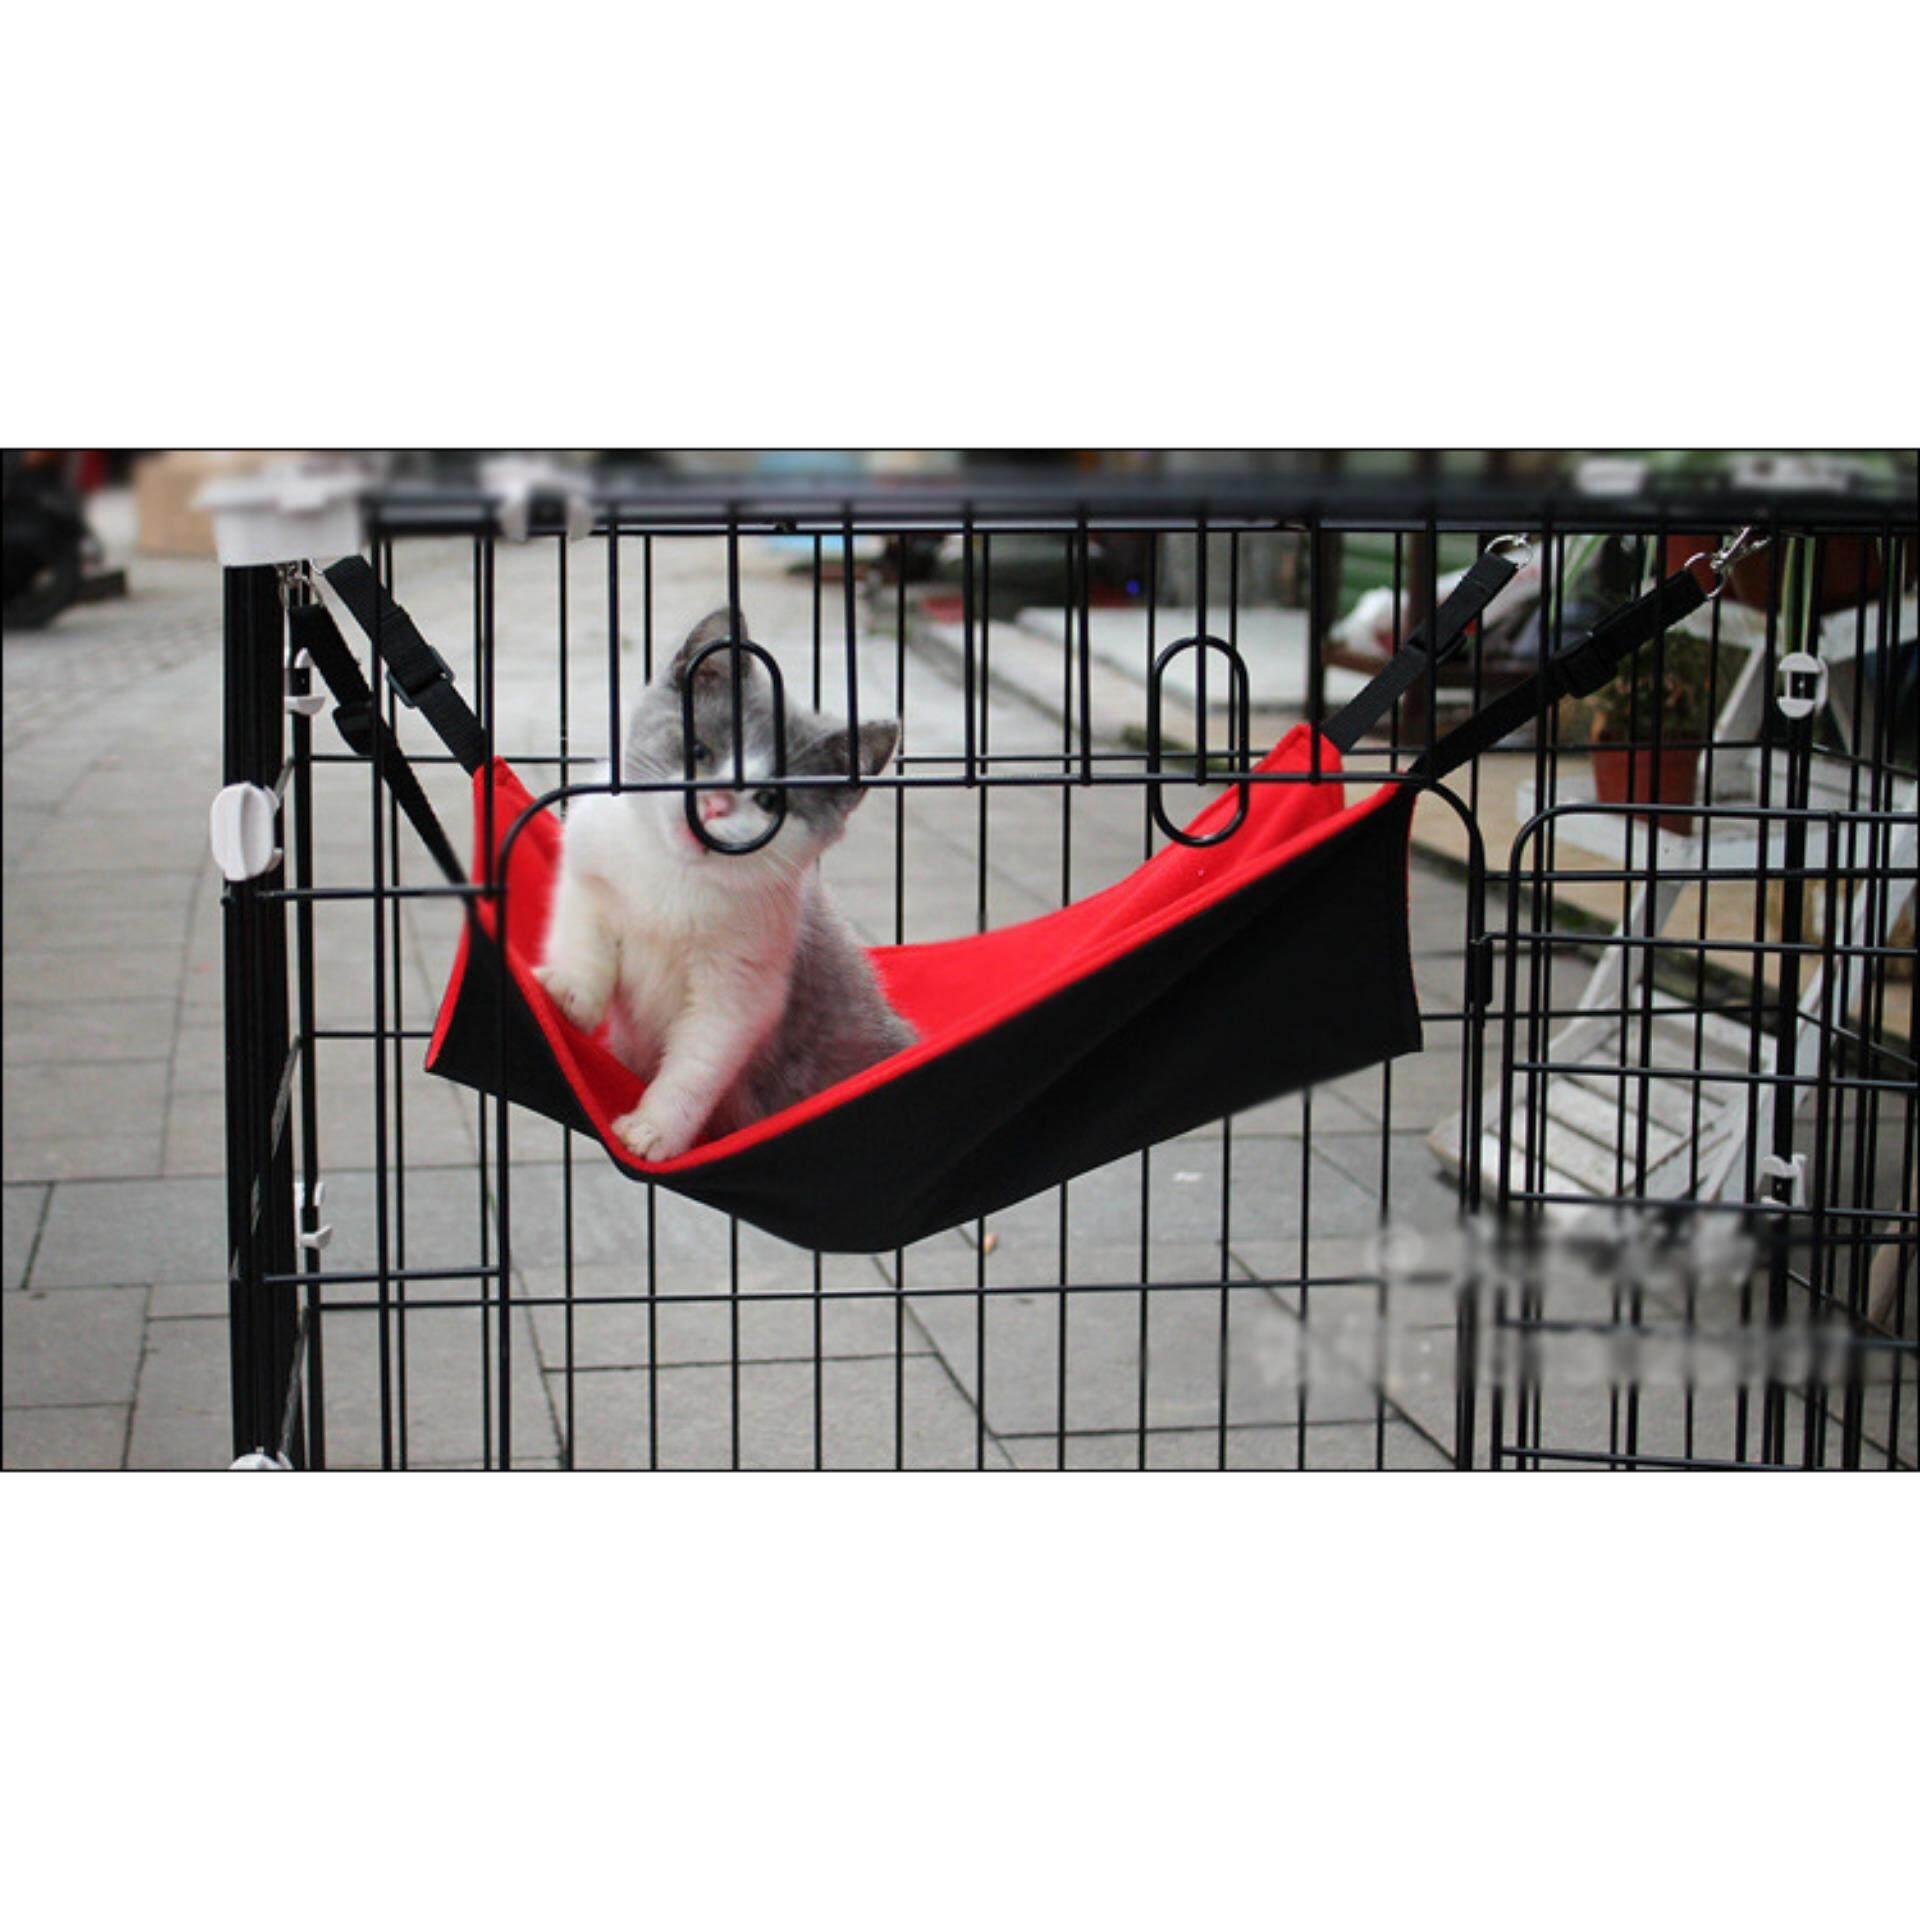 Pet Sugar Glitter Cat Kitten Sleeping Water Resistant Hammock Hanging Bed 48cm x 47cm (Red)